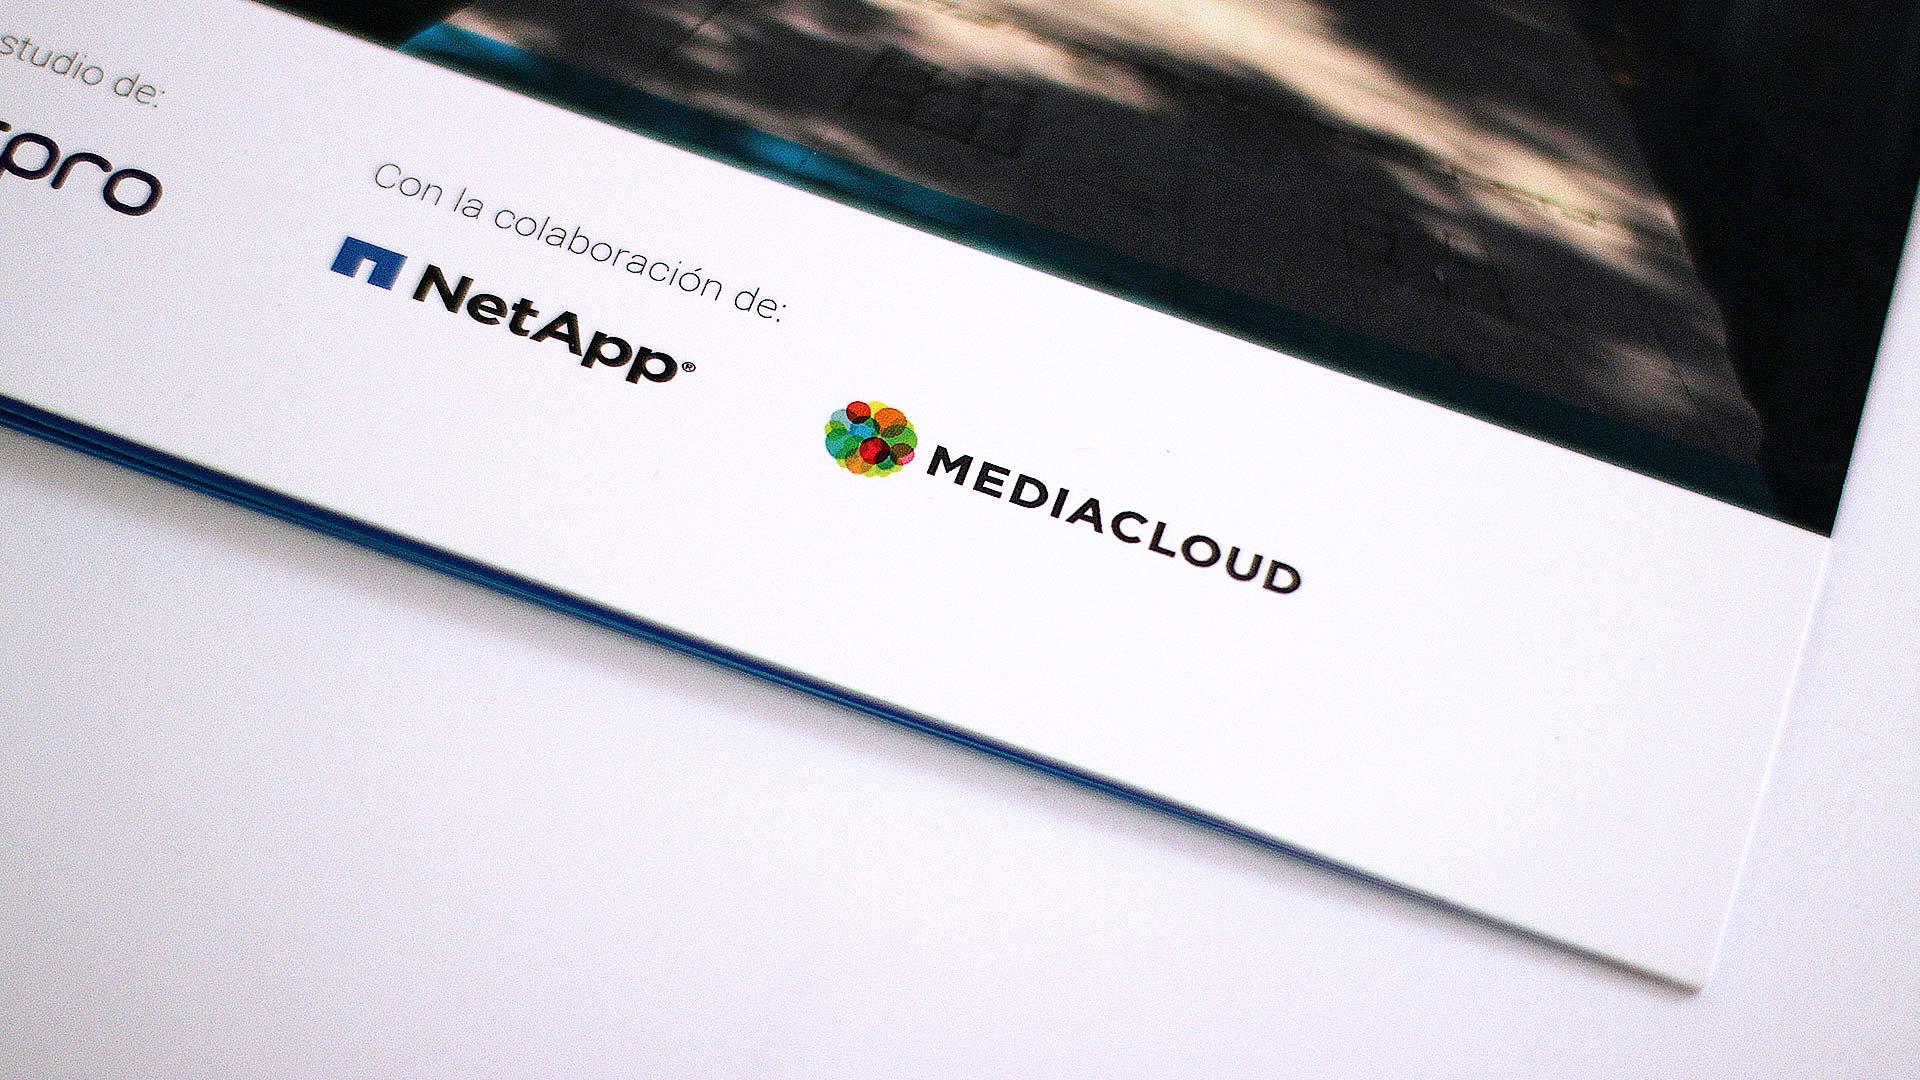 netapp-mediacloud-content-marketing-informe-resumen-ejecutivo-ebook-2017-10